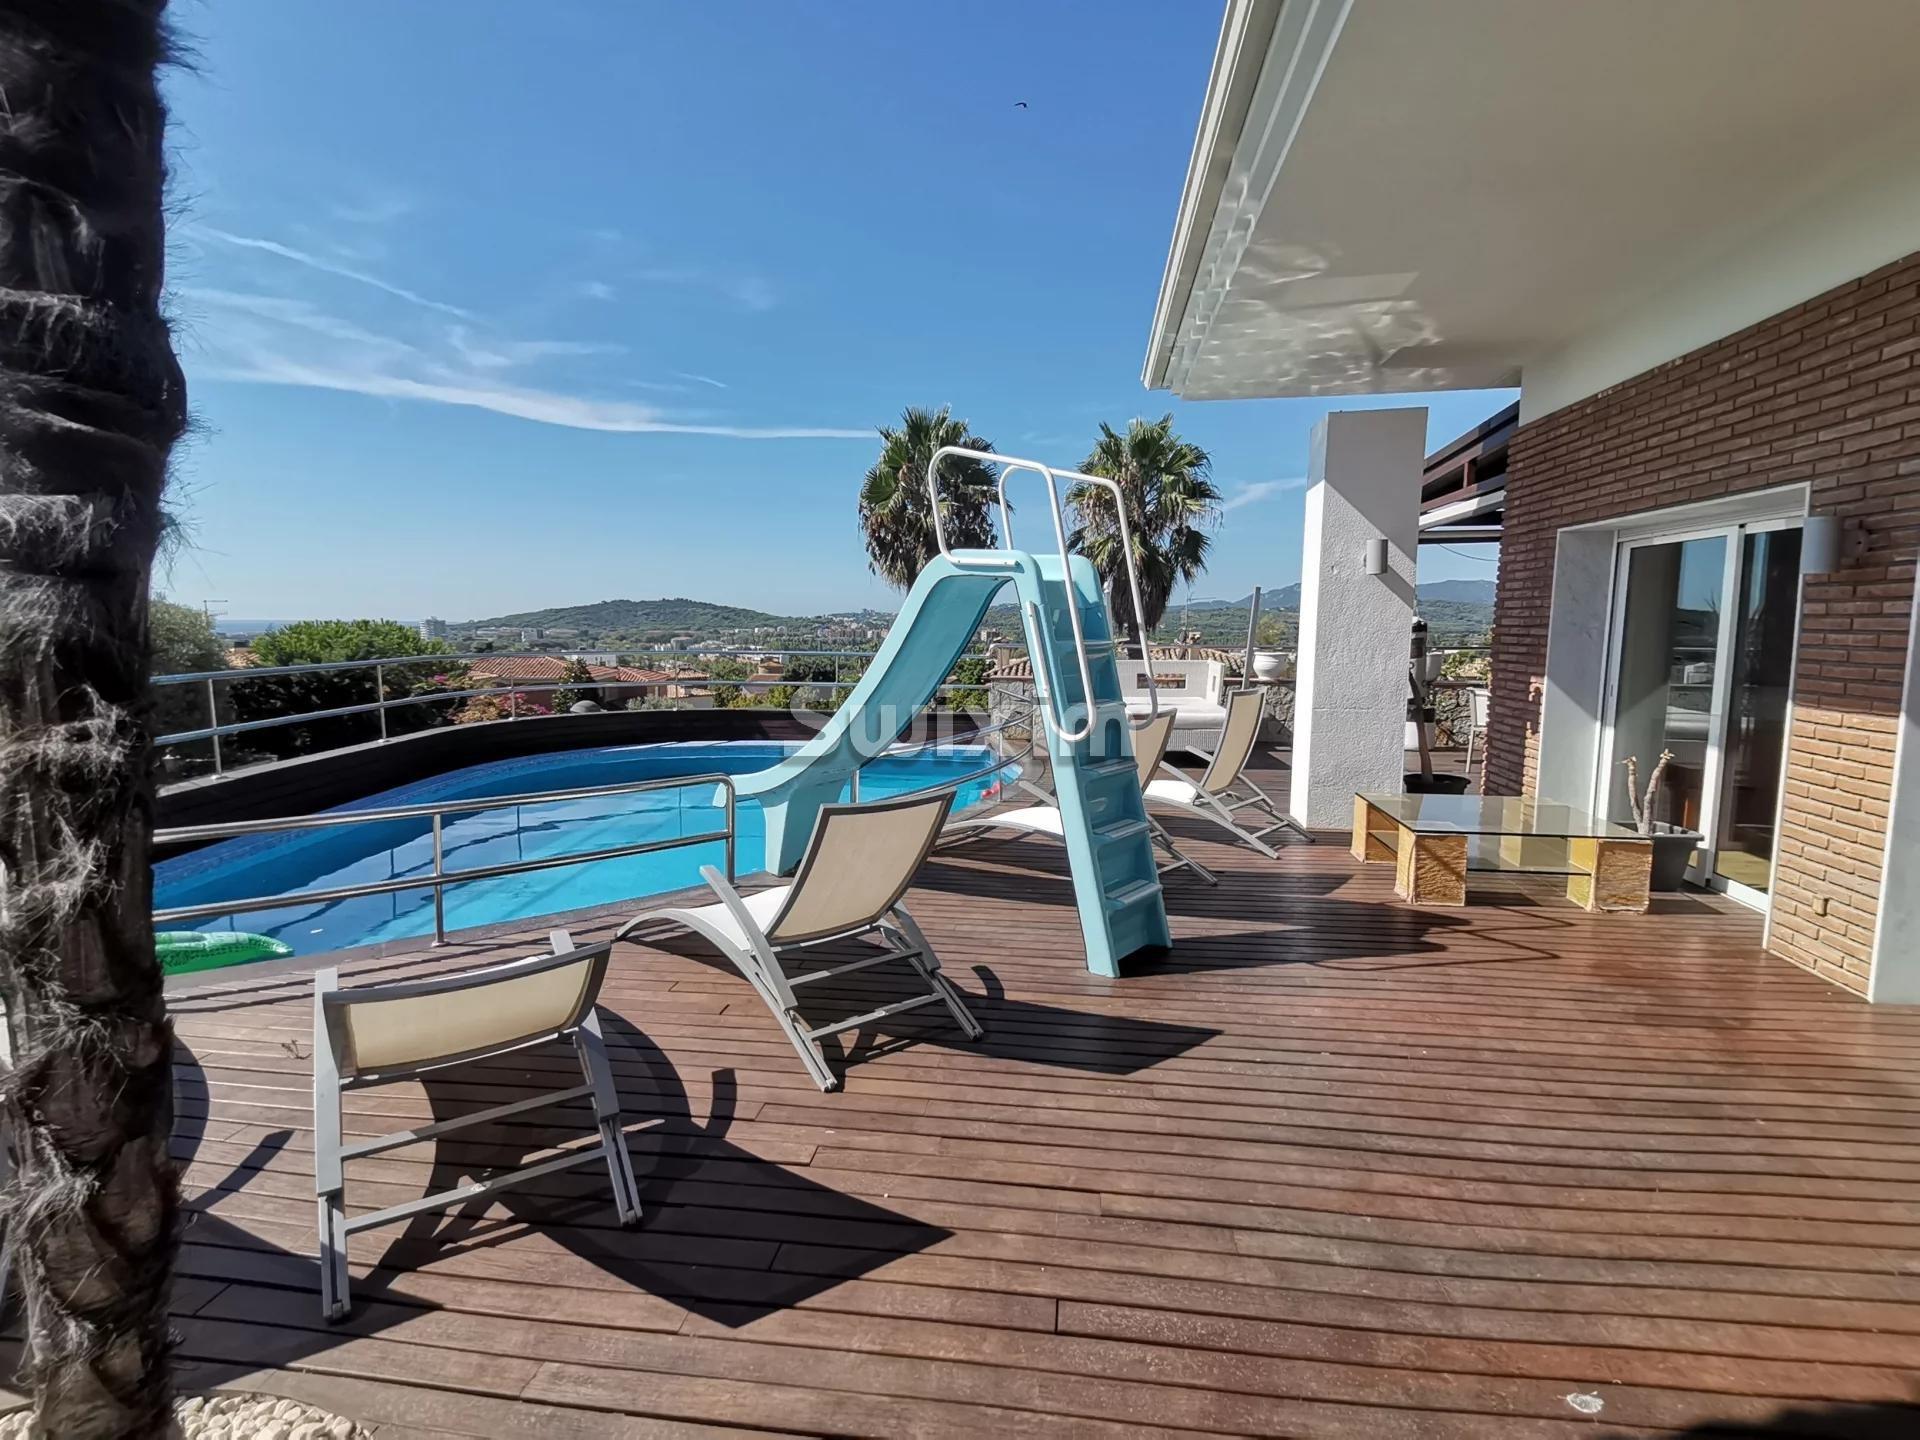 Grande opportunité ! Belle maison avec terrasse et piscine